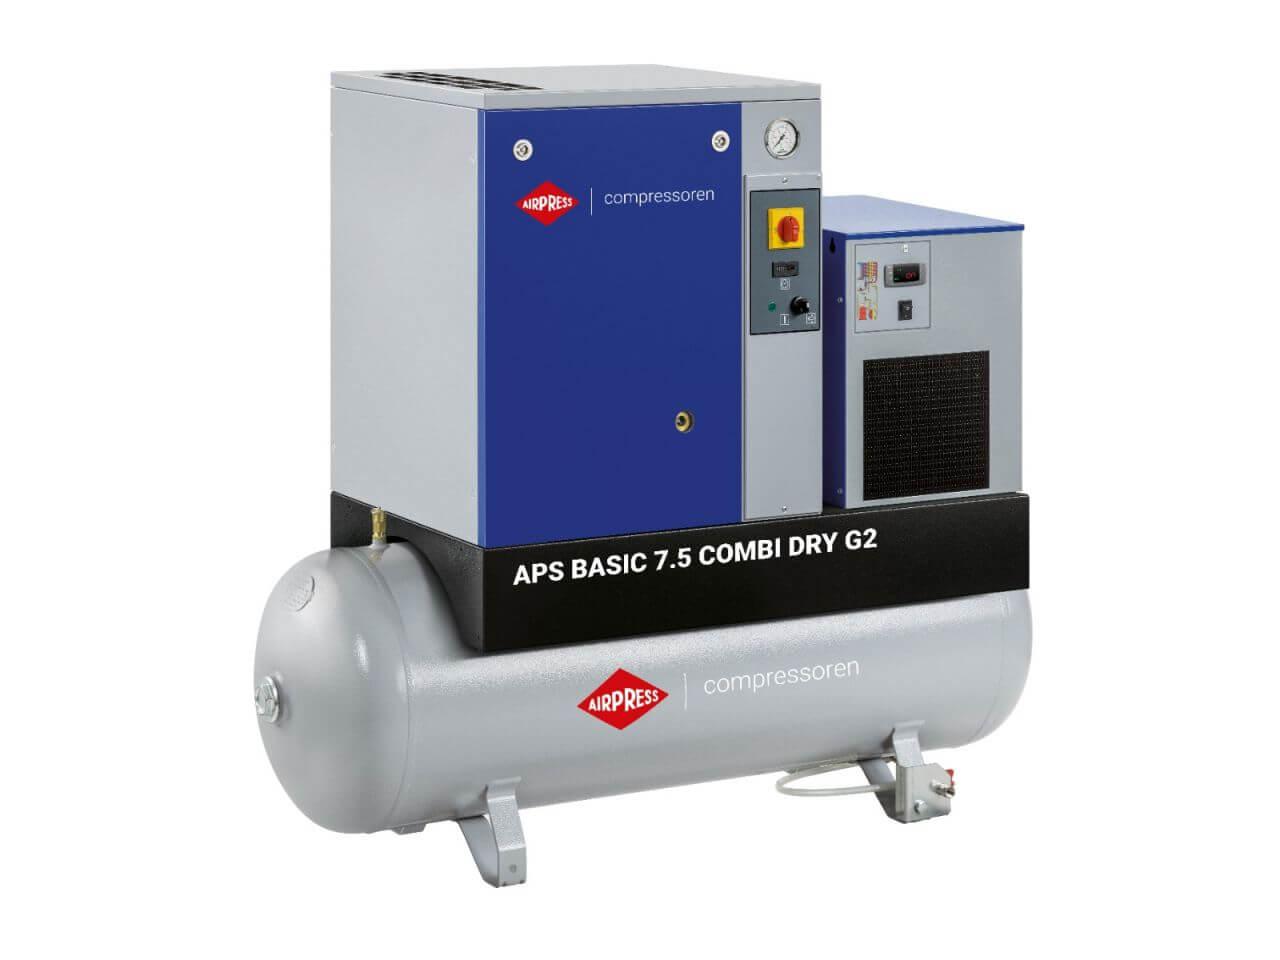 APS 7.5 combi dry